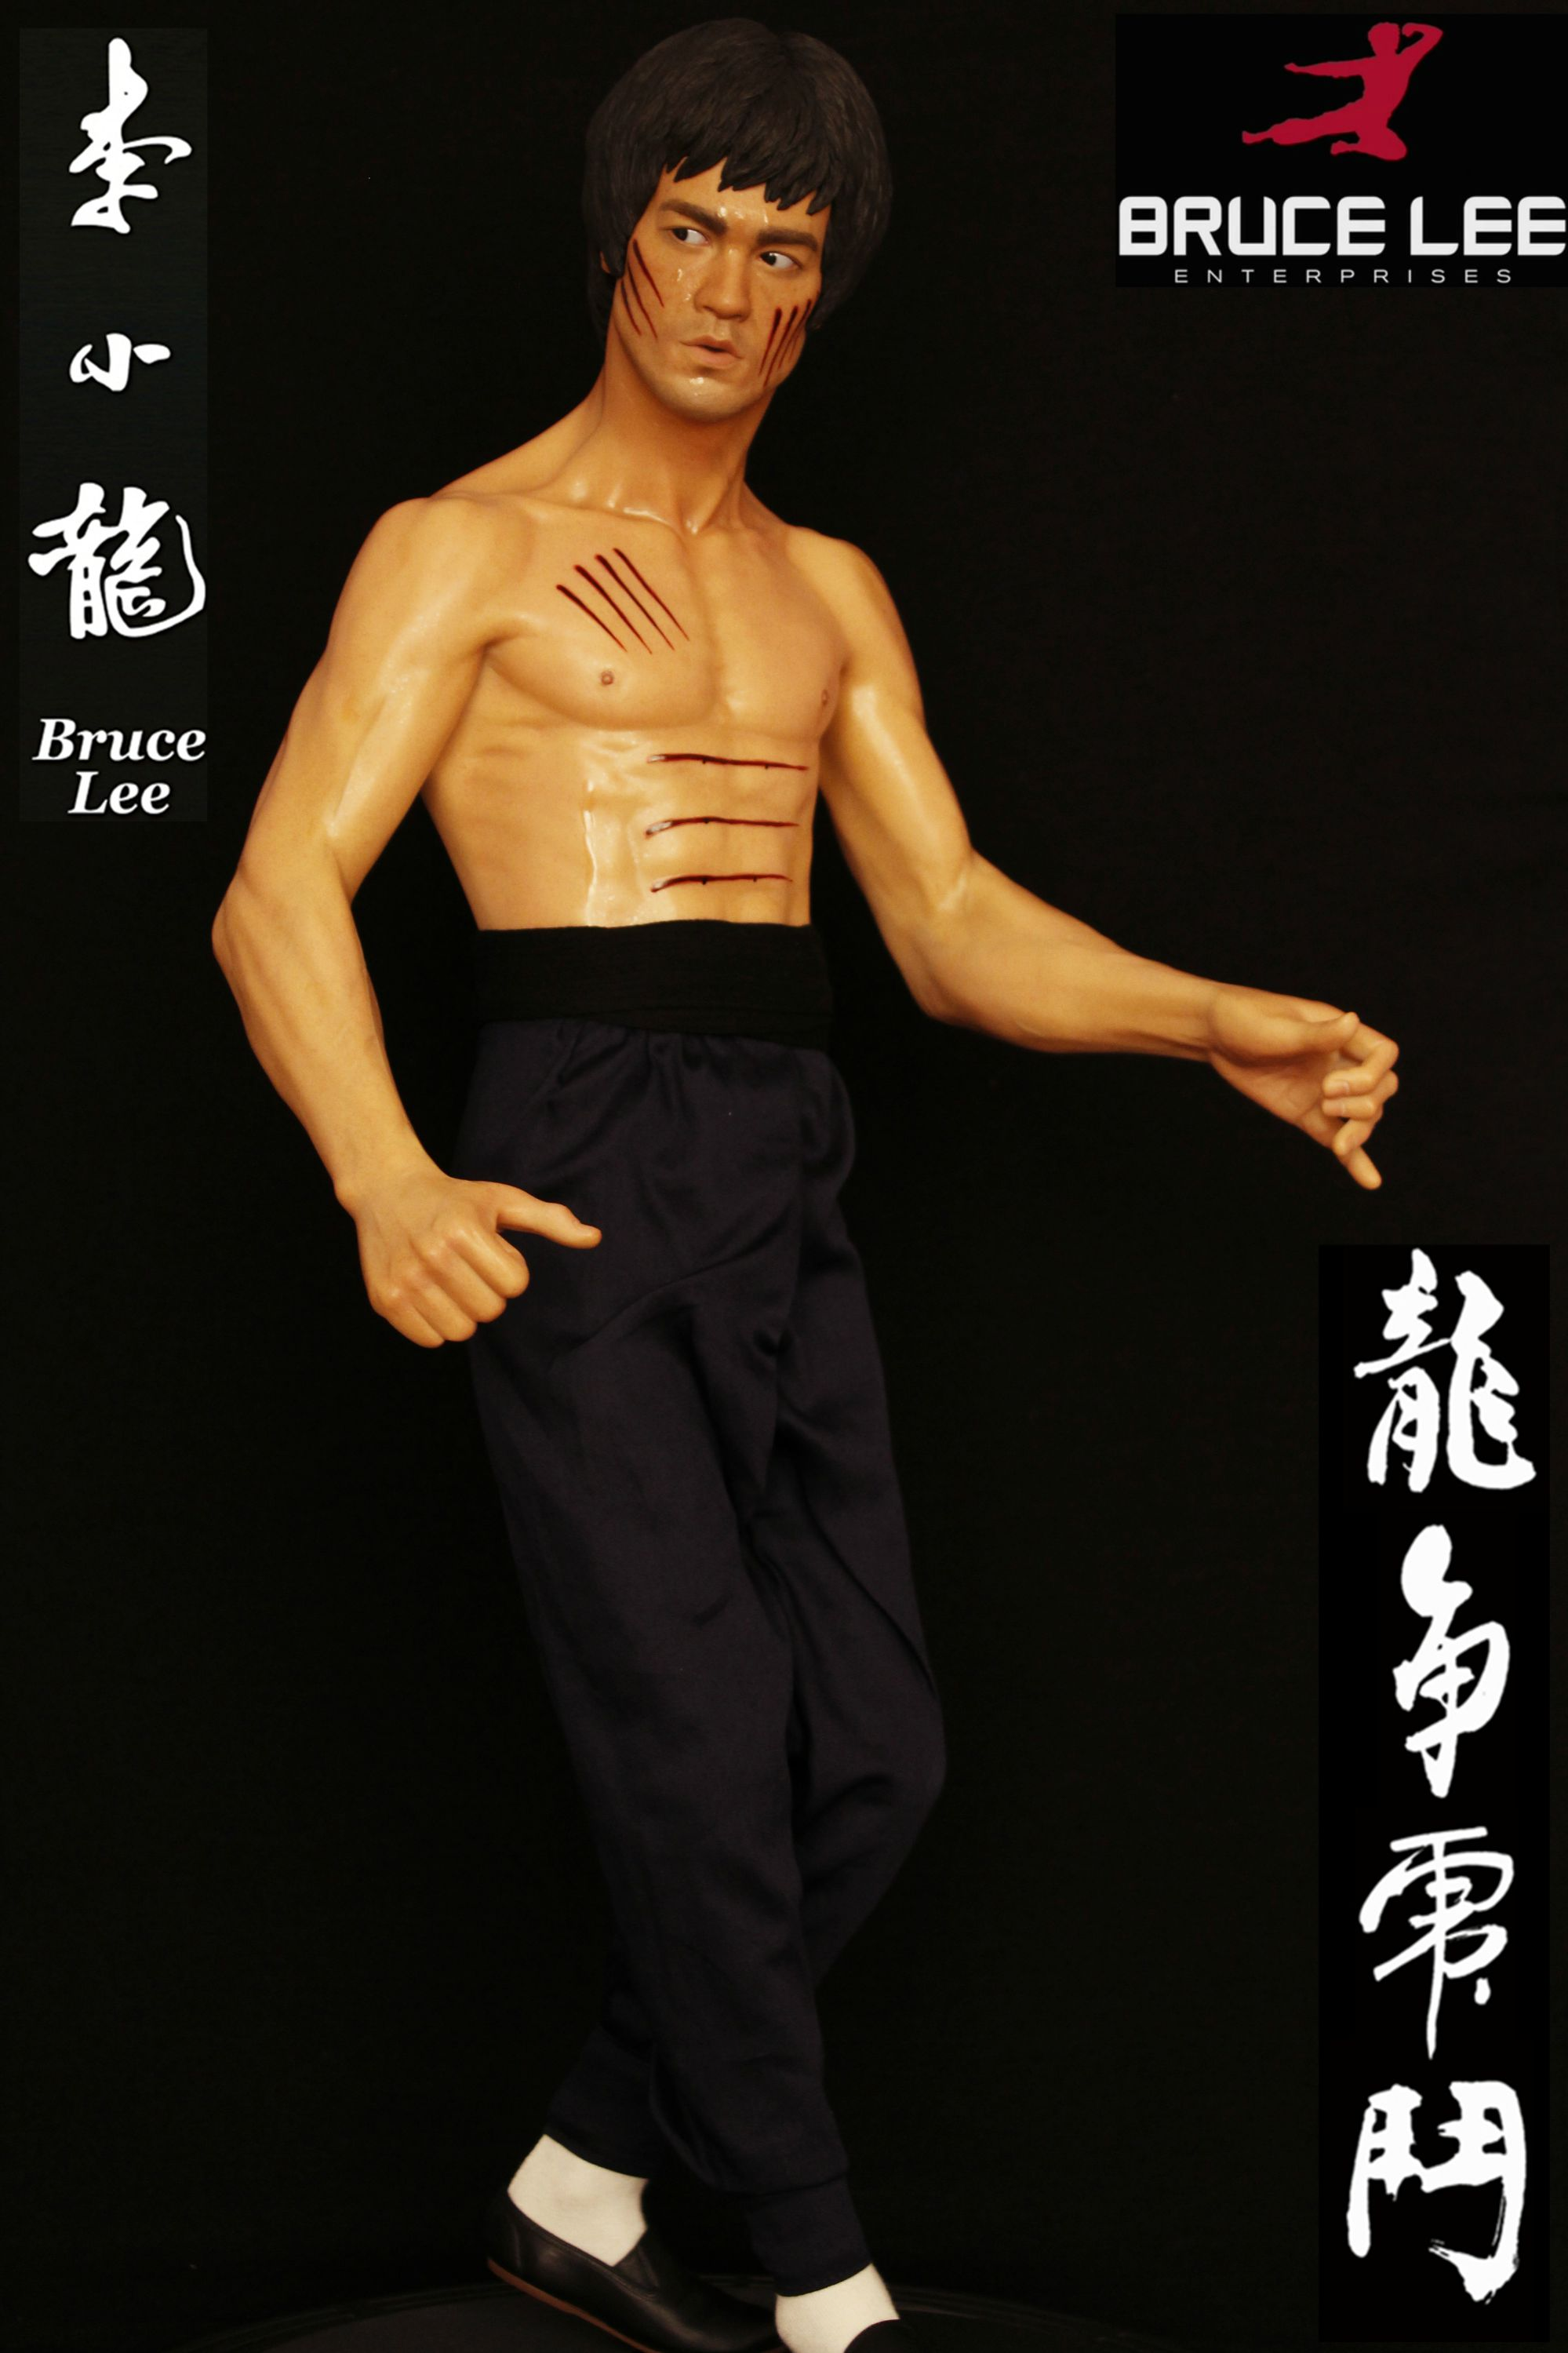 [Blitzway] Bruce Lee Tribute - 1/3 Scale - LANÇADO!!! - Página 6 212442x5vpymyptau8m8zy